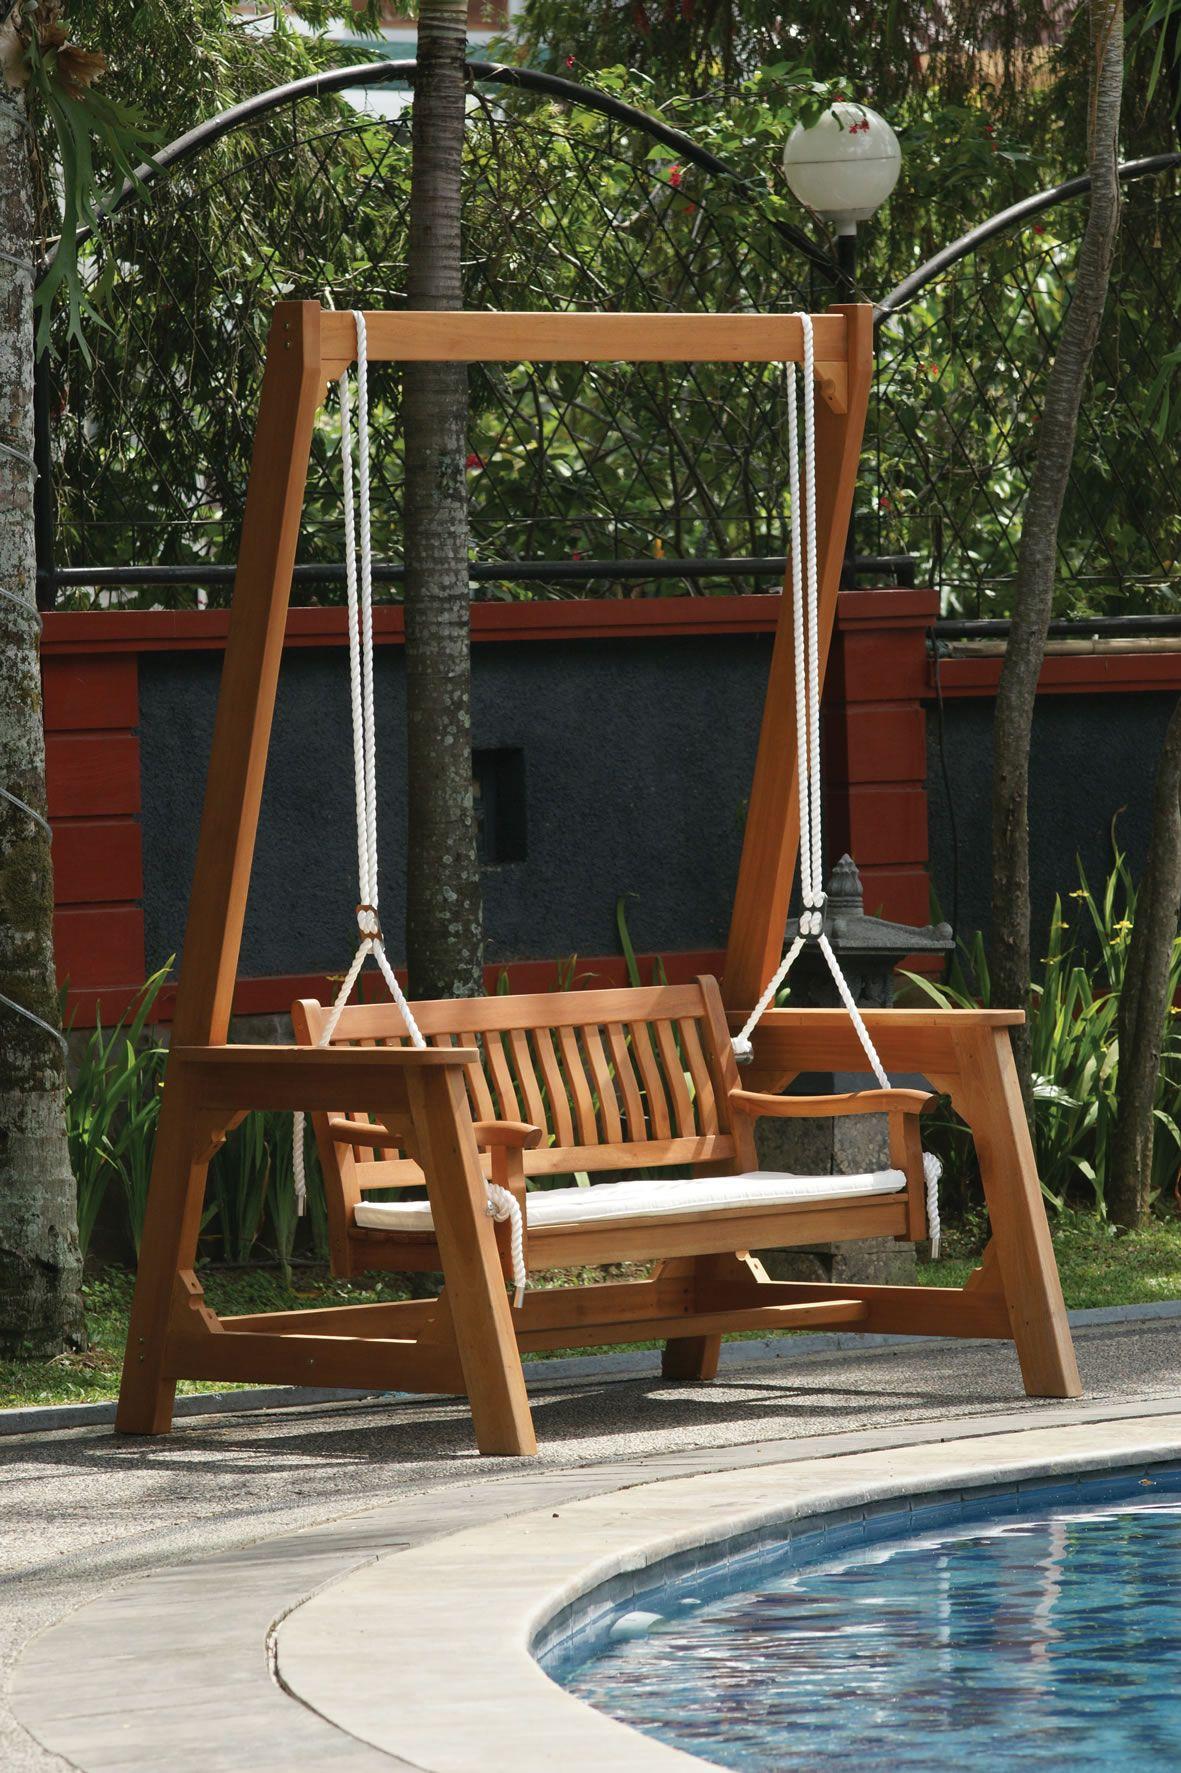 Garden Swings: The Enchanting Element in Your Backyard in 2018 ...